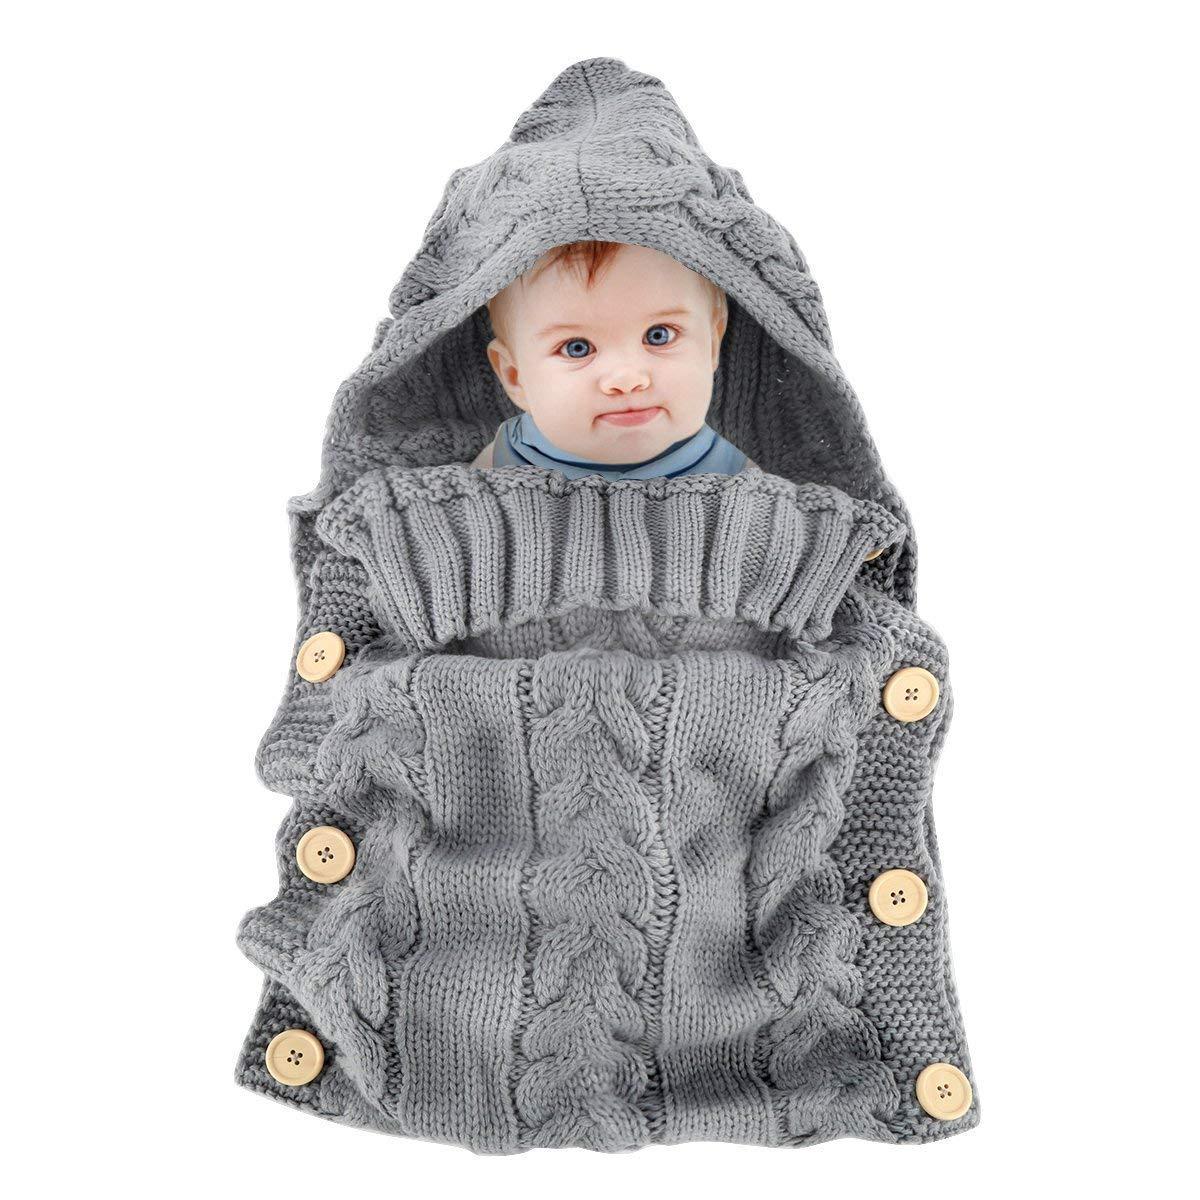 brand new 323d5 99a23 Newborn Baby Wrap Swaddle Blanket Knit Toddler Sleeping Bag Sleep Sack  Stroller Wrap, Best for 0-6 Months Baby Shower Gift (Grey)